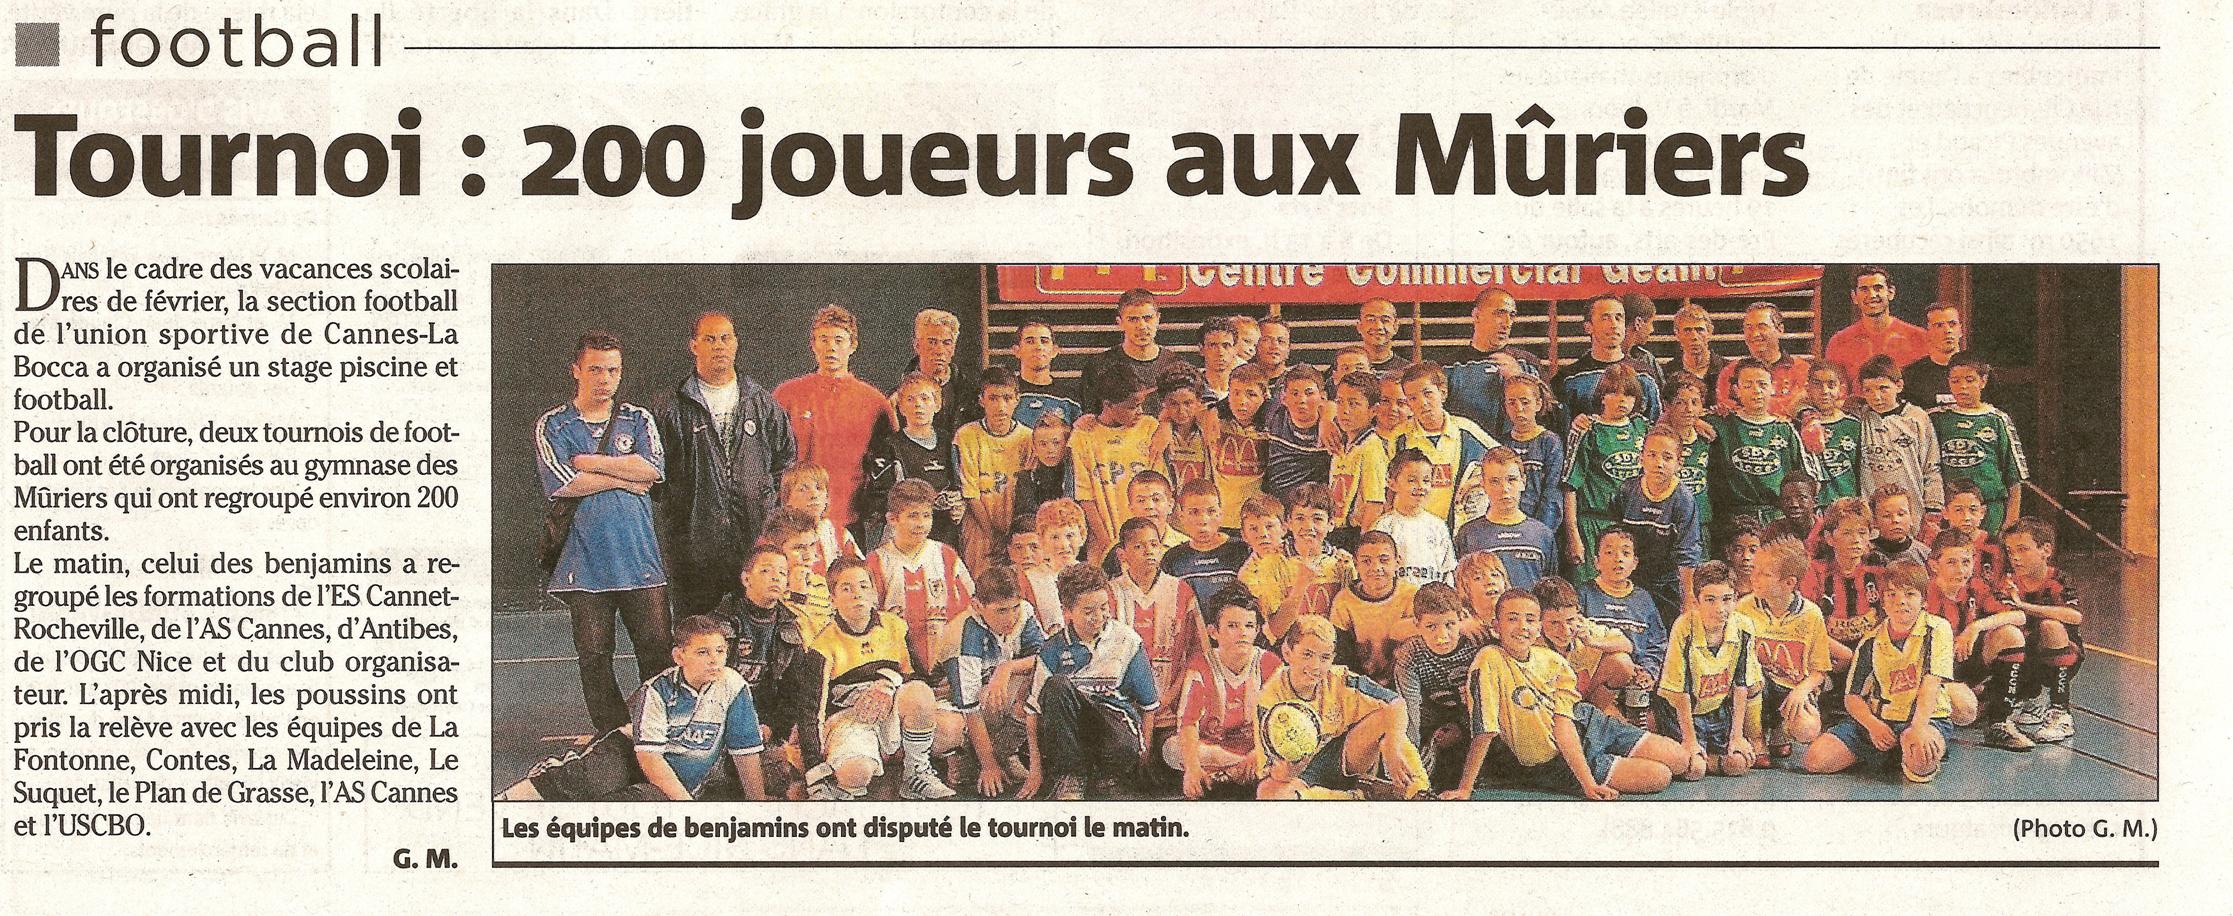 NICE MATIN FEVRIER 2006 - PREMIER TOURNOI FUTSAL JETIX KIDS CUP2